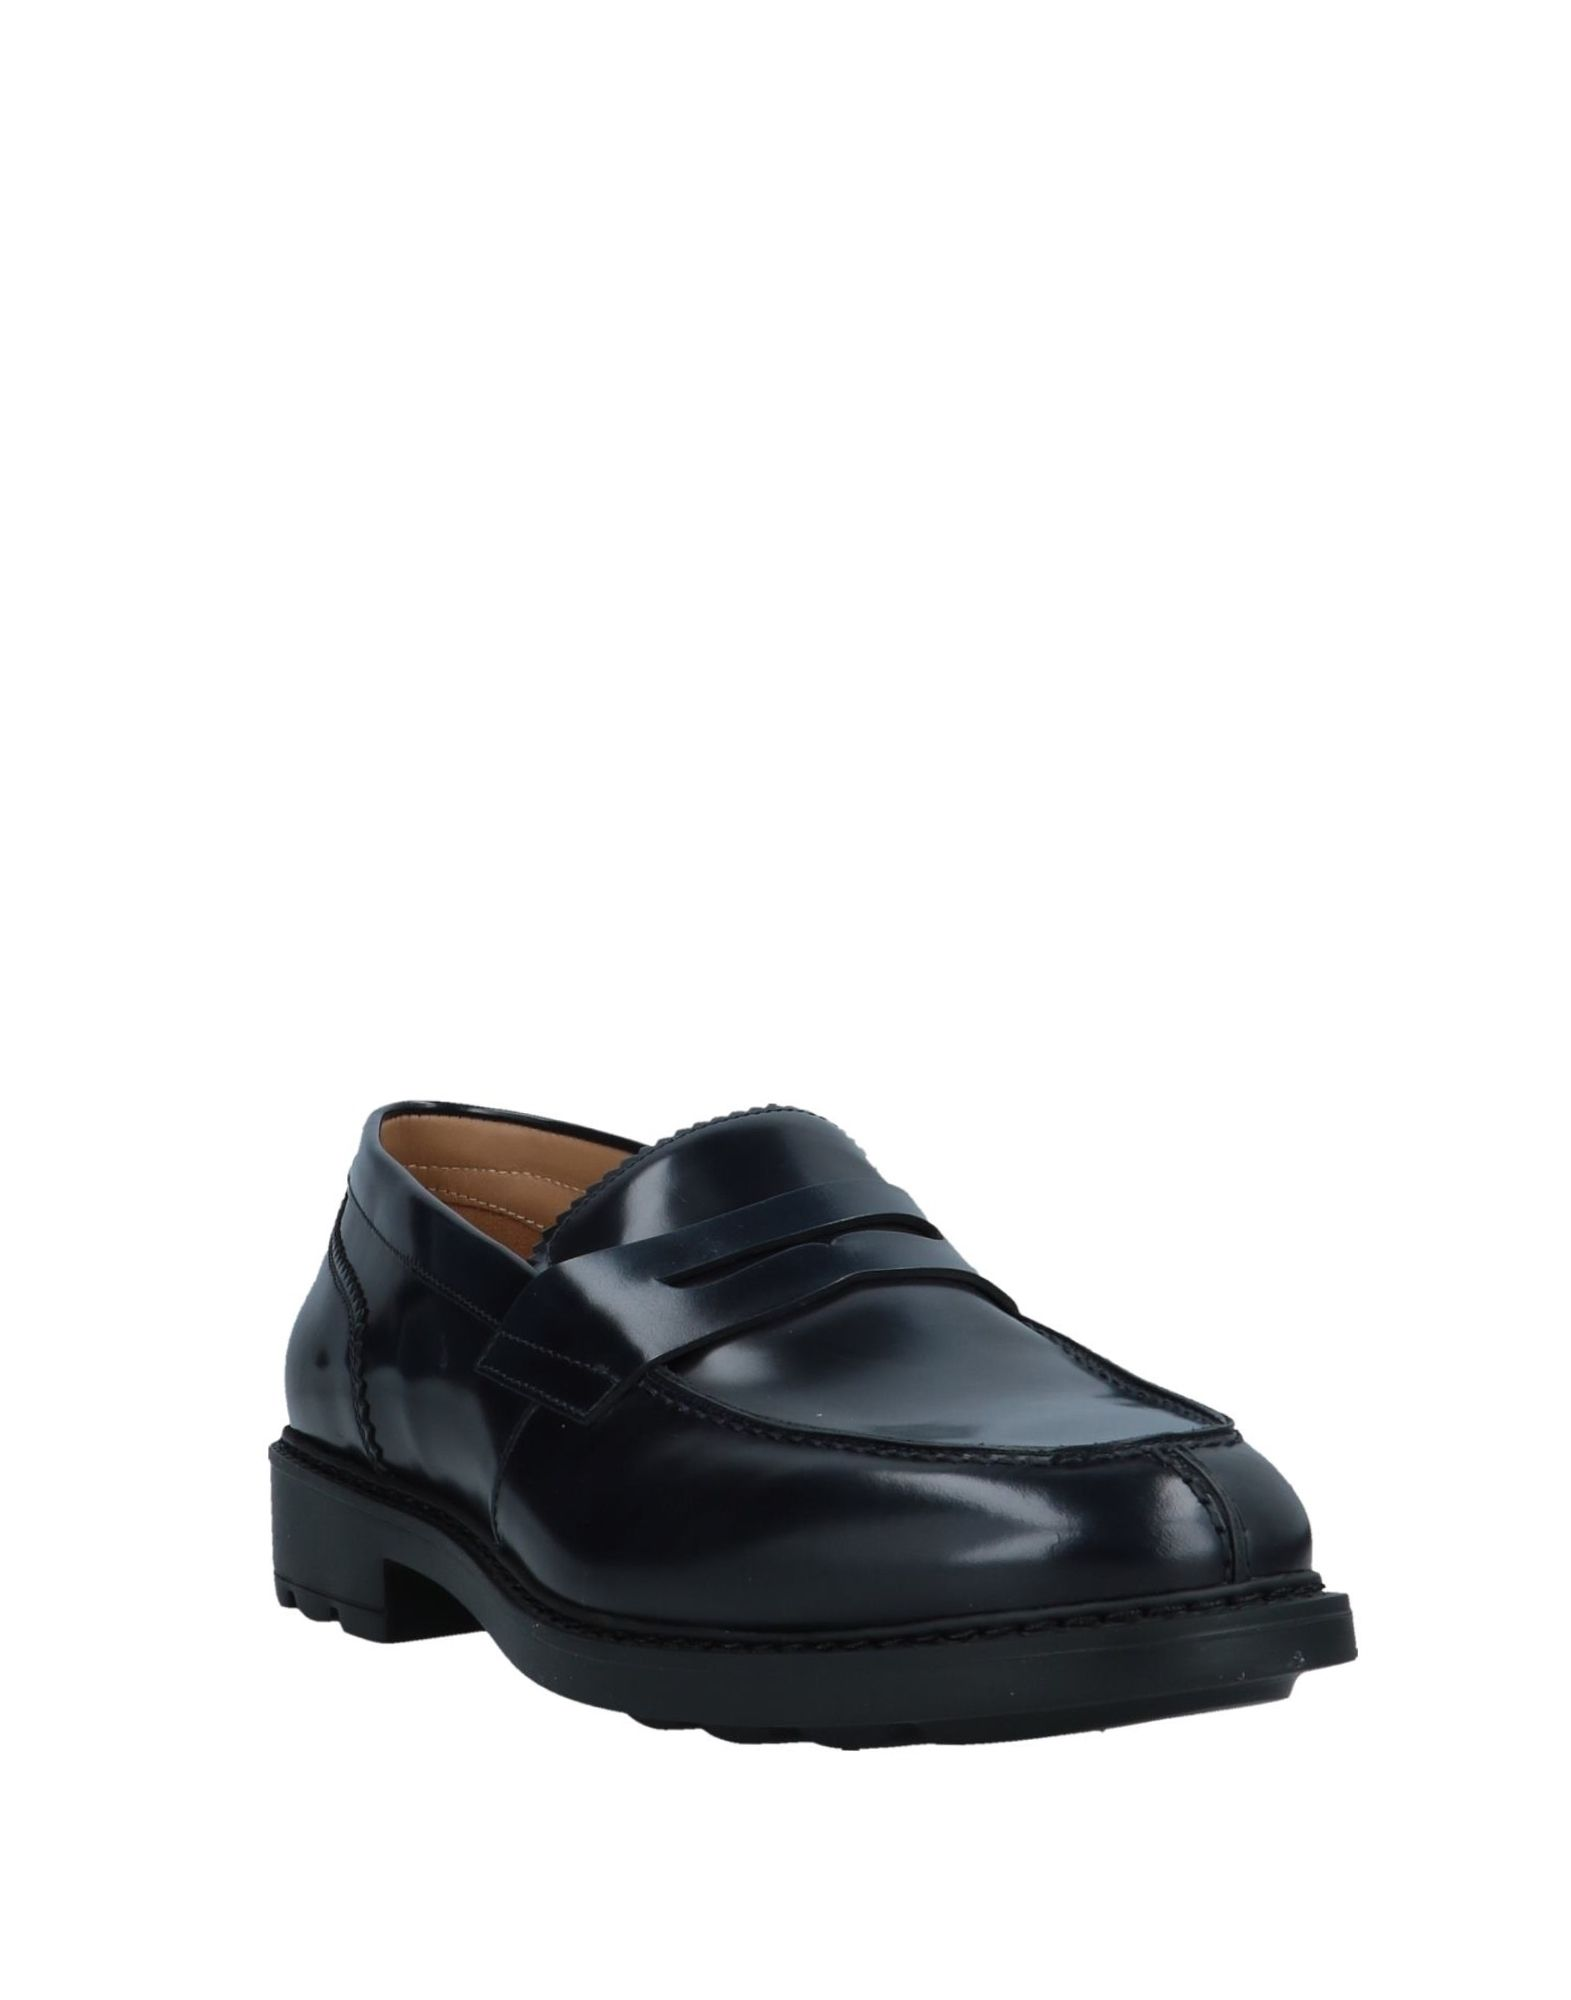 Rabatt echte Schuhe Herren Triver Flight Mokassins Herren Schuhe  11556975EX 707552